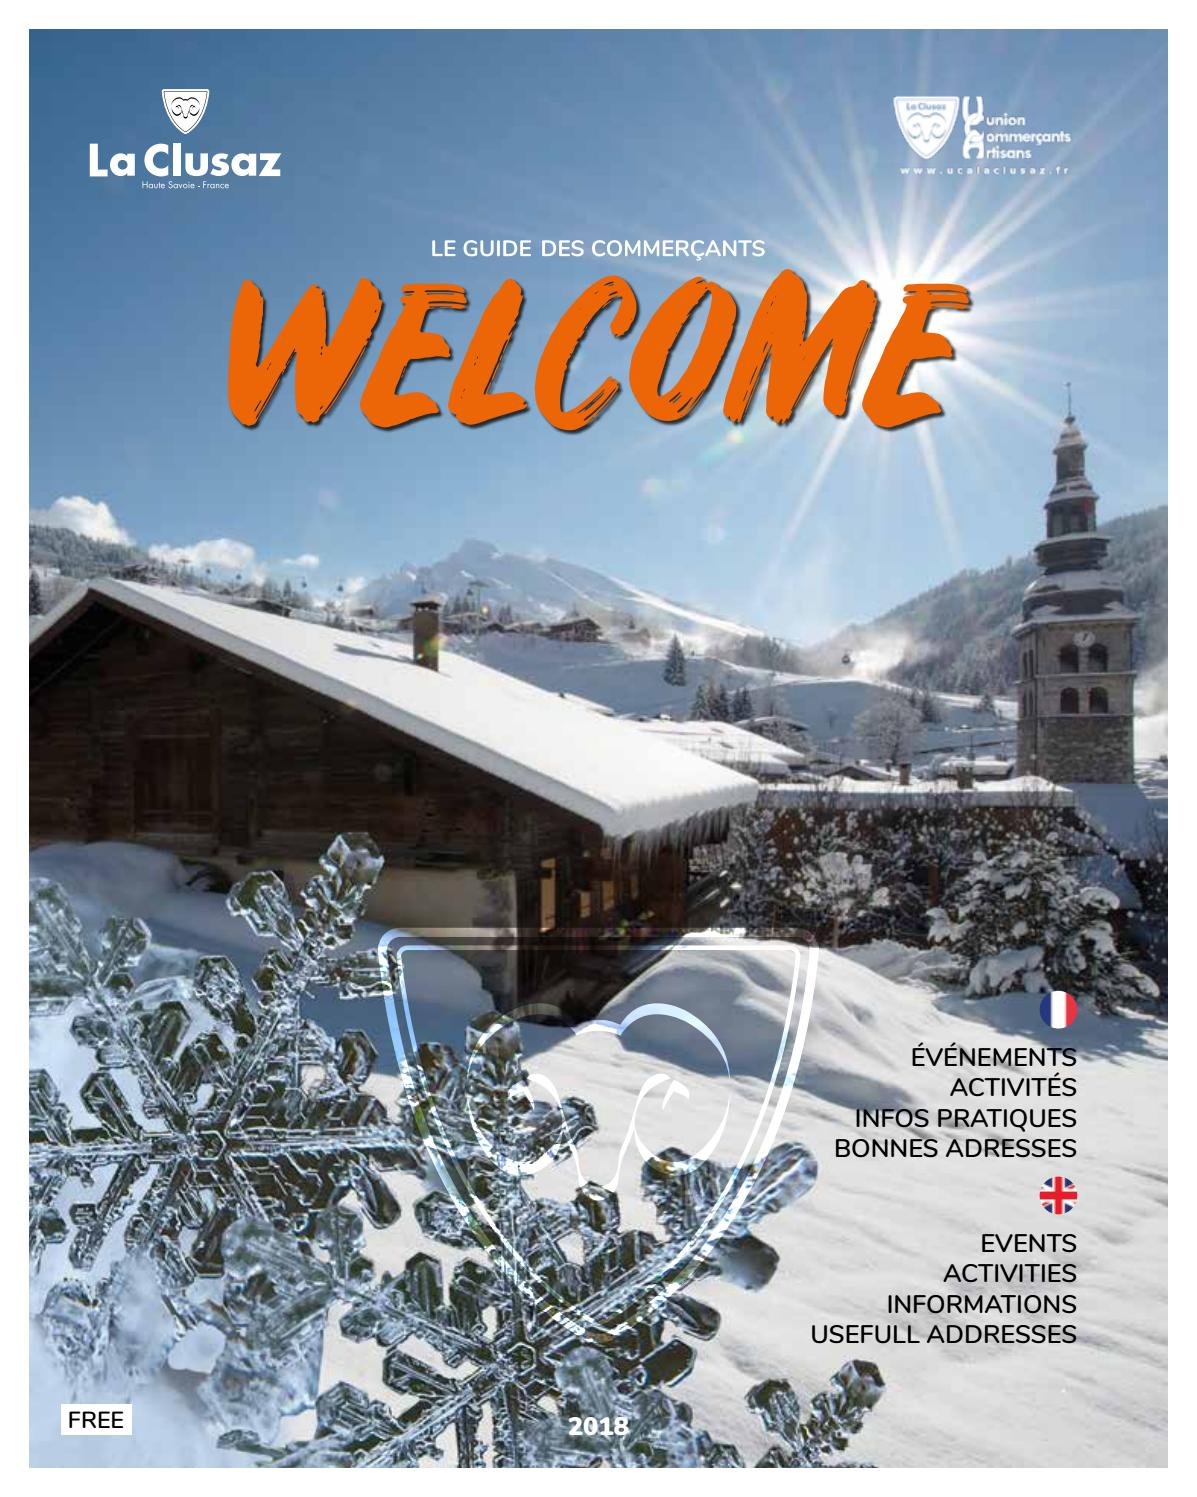 GUIDE UCA LA CLUSAZ by FreePresse - issuu 156559f421b3